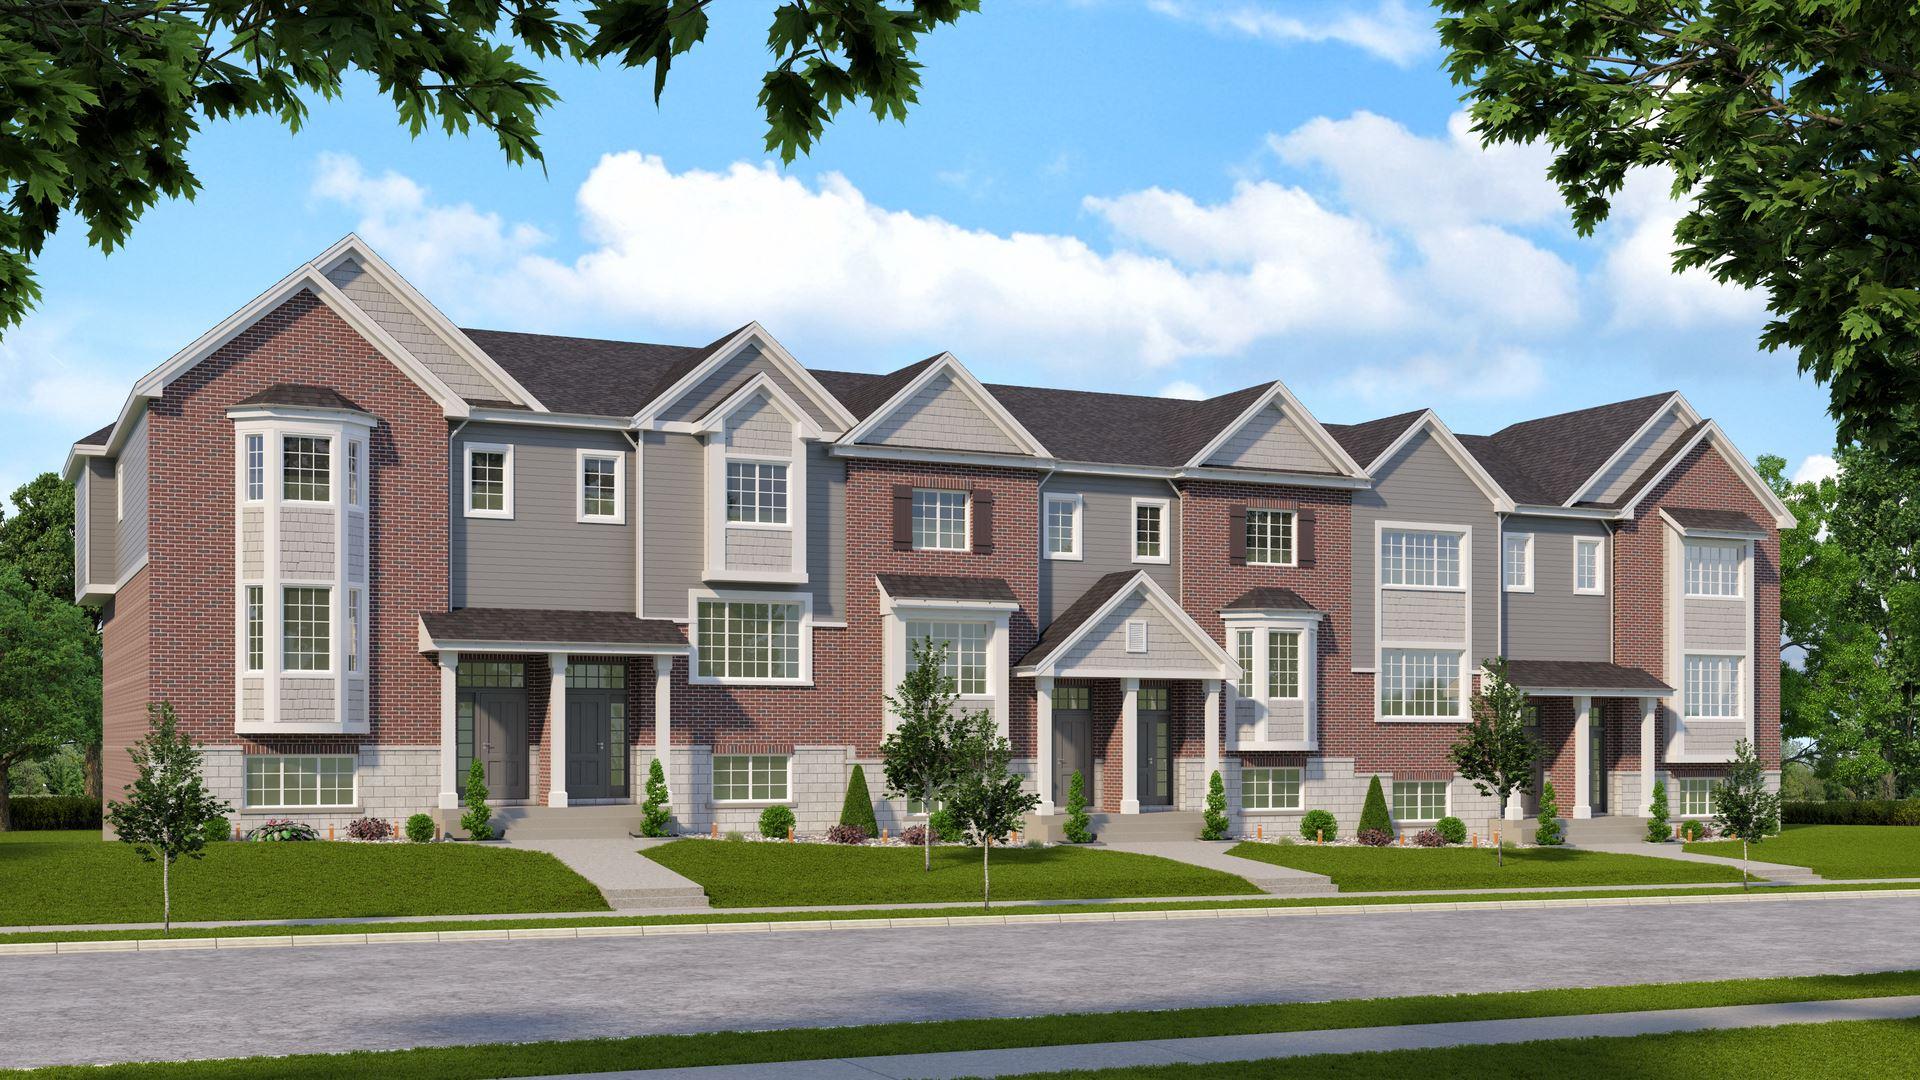 408 North Cass Avenue #3, Westmont, IL 60559 - #: 10575663